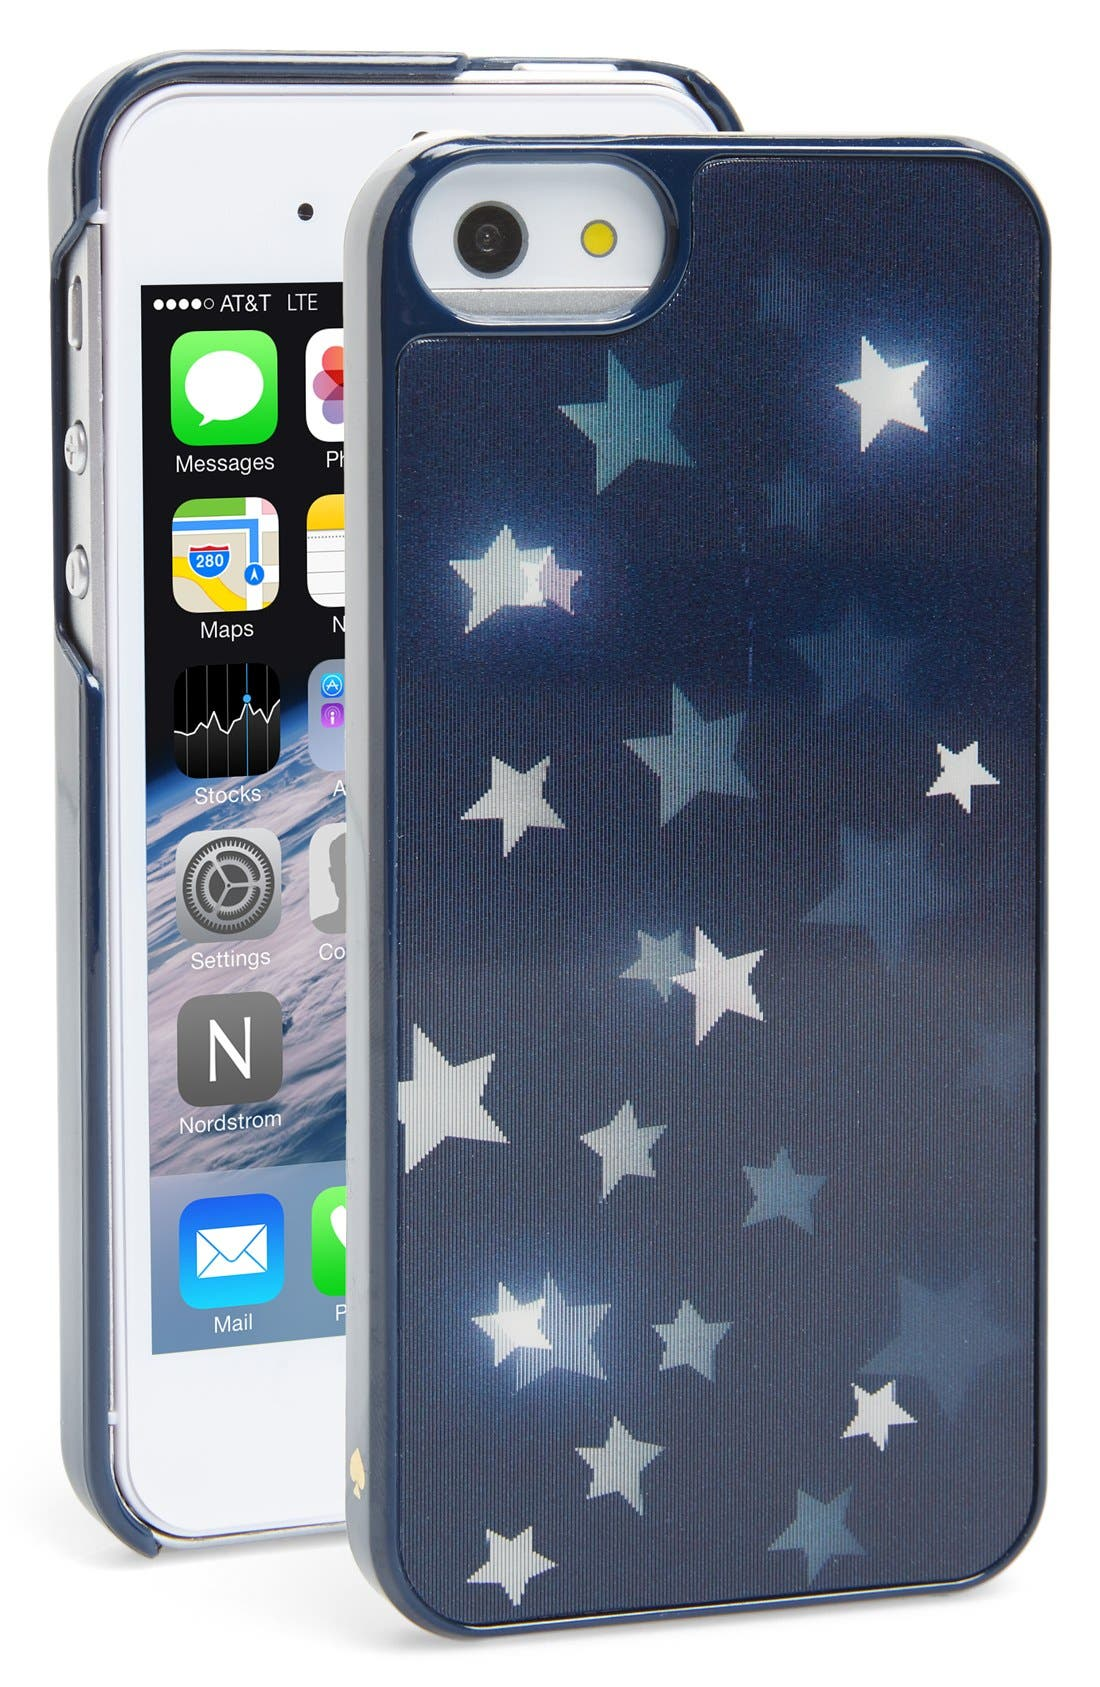 Main Image - kate spade new york 'night sky' iPhone 5 & 5s case